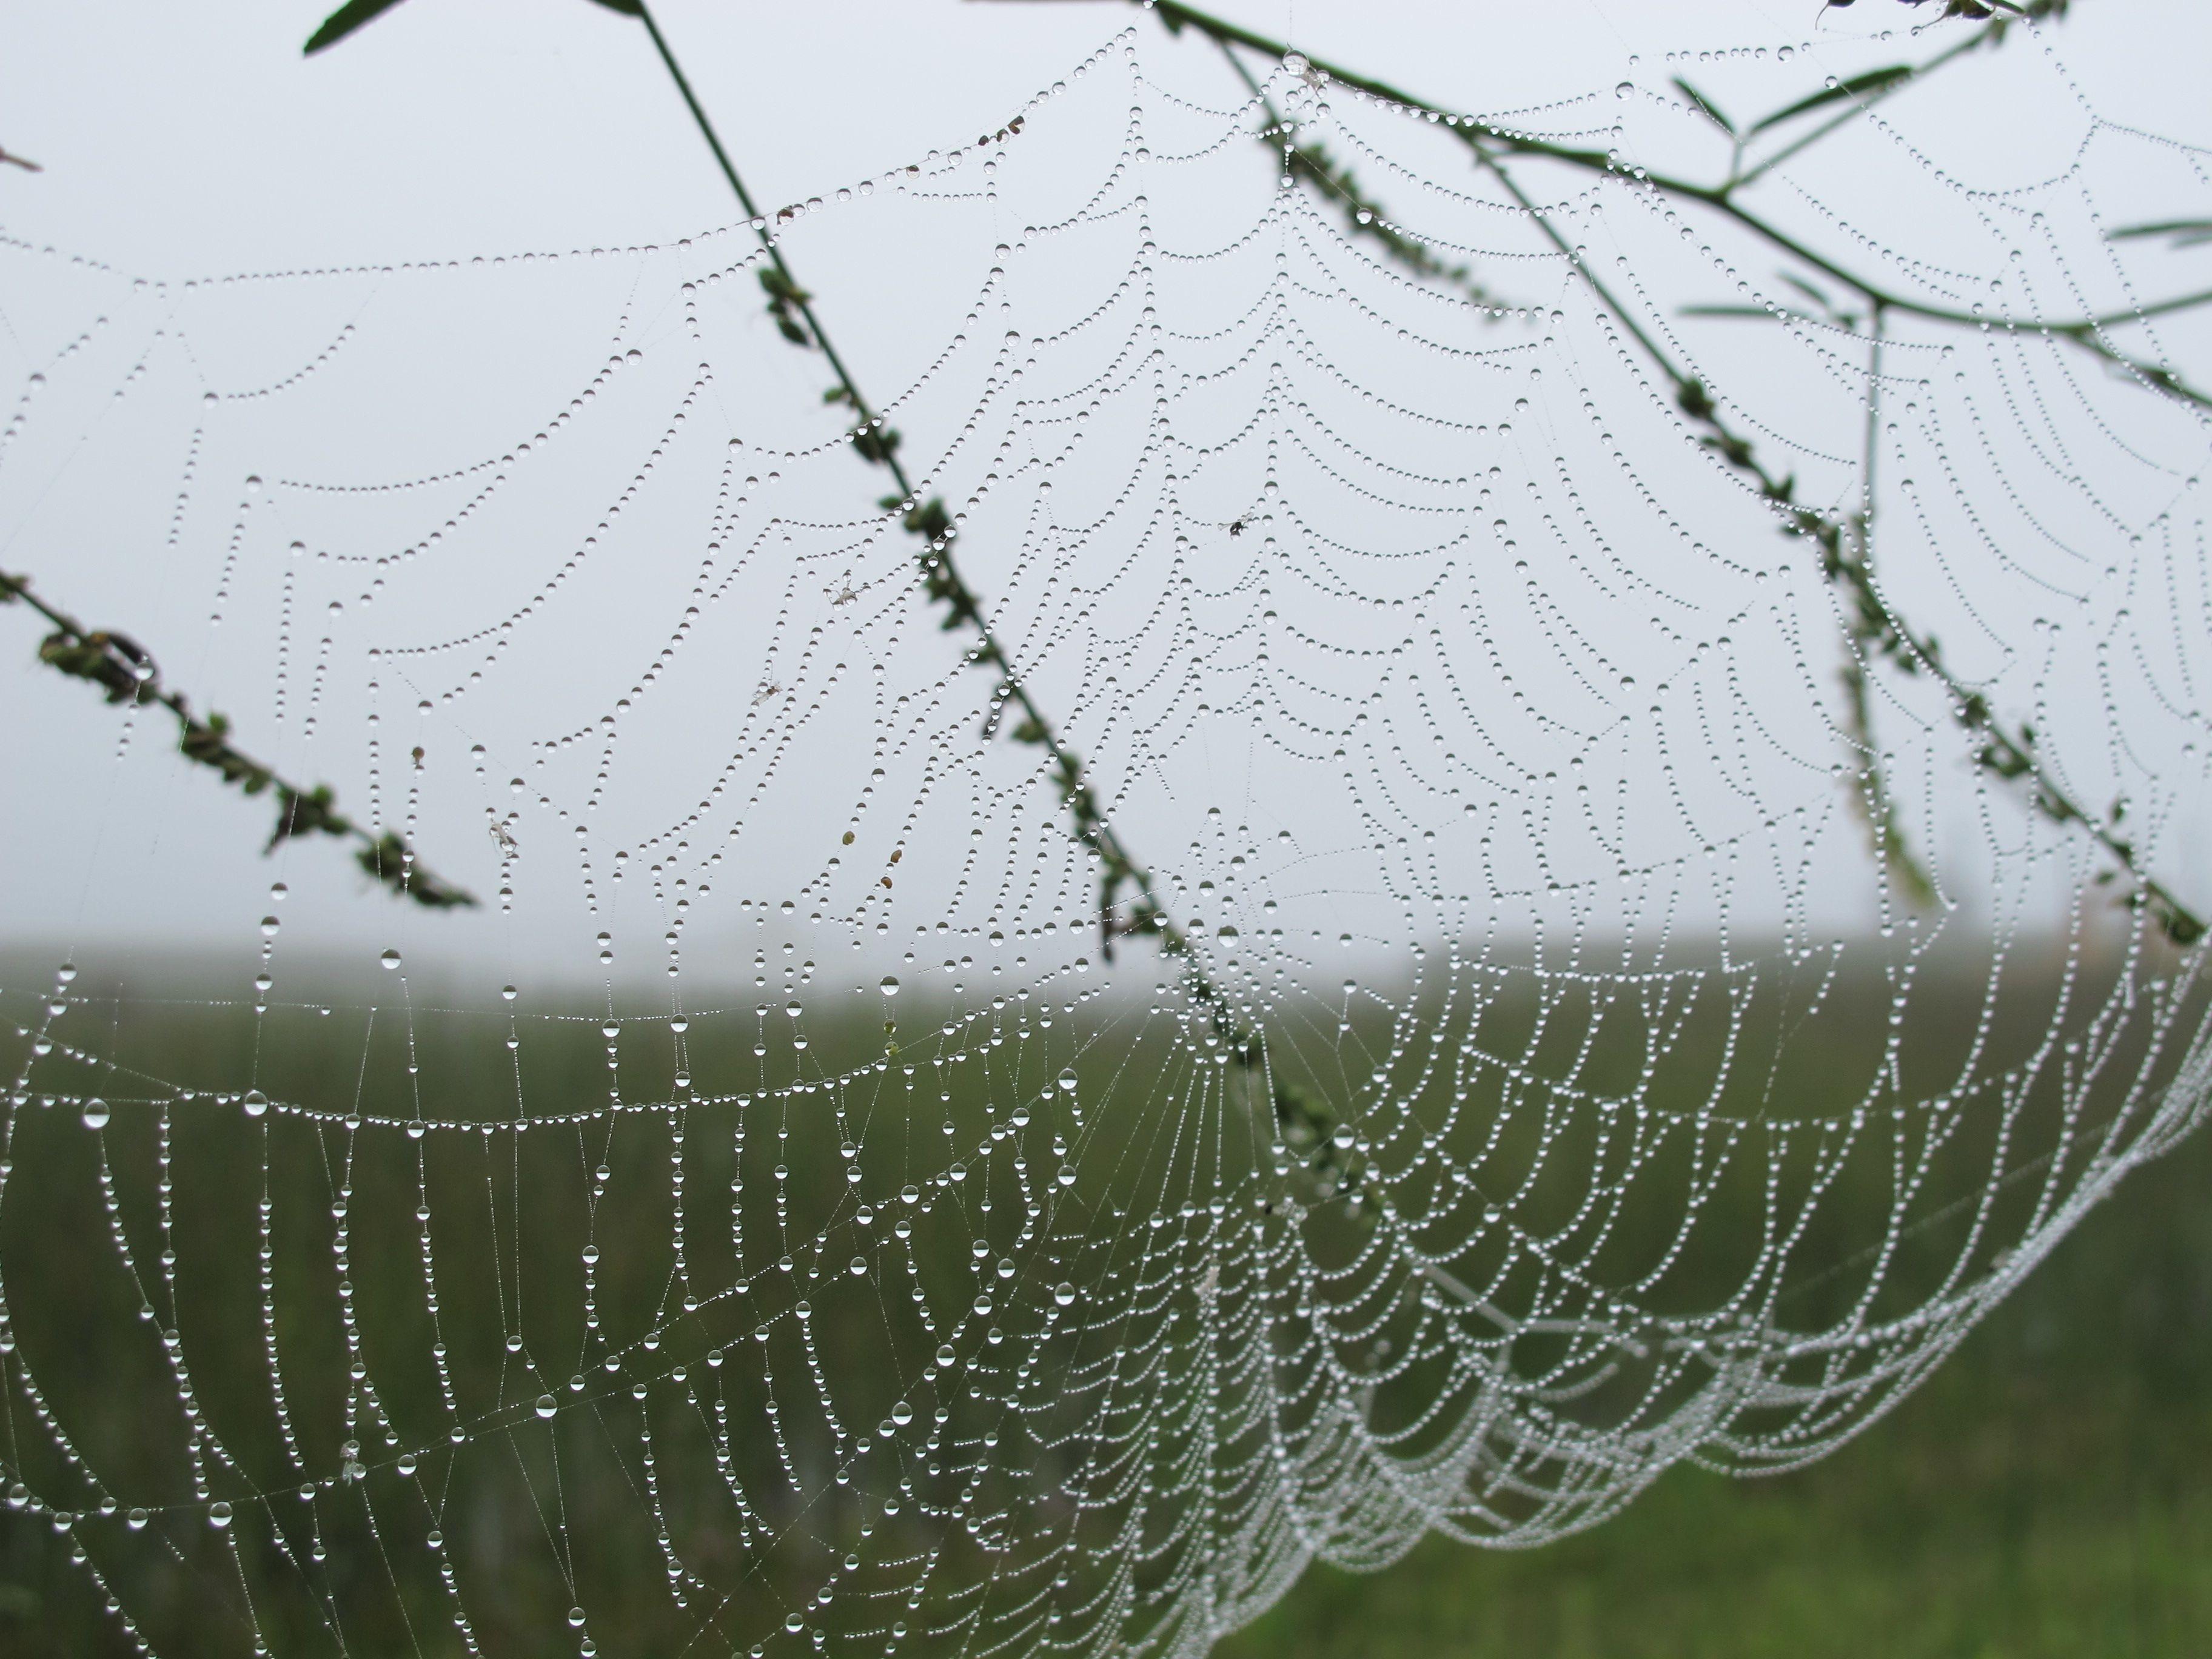 Sandra Binion, Spider web, stampa inkjet d'archivio, 2016, 46x61 cm